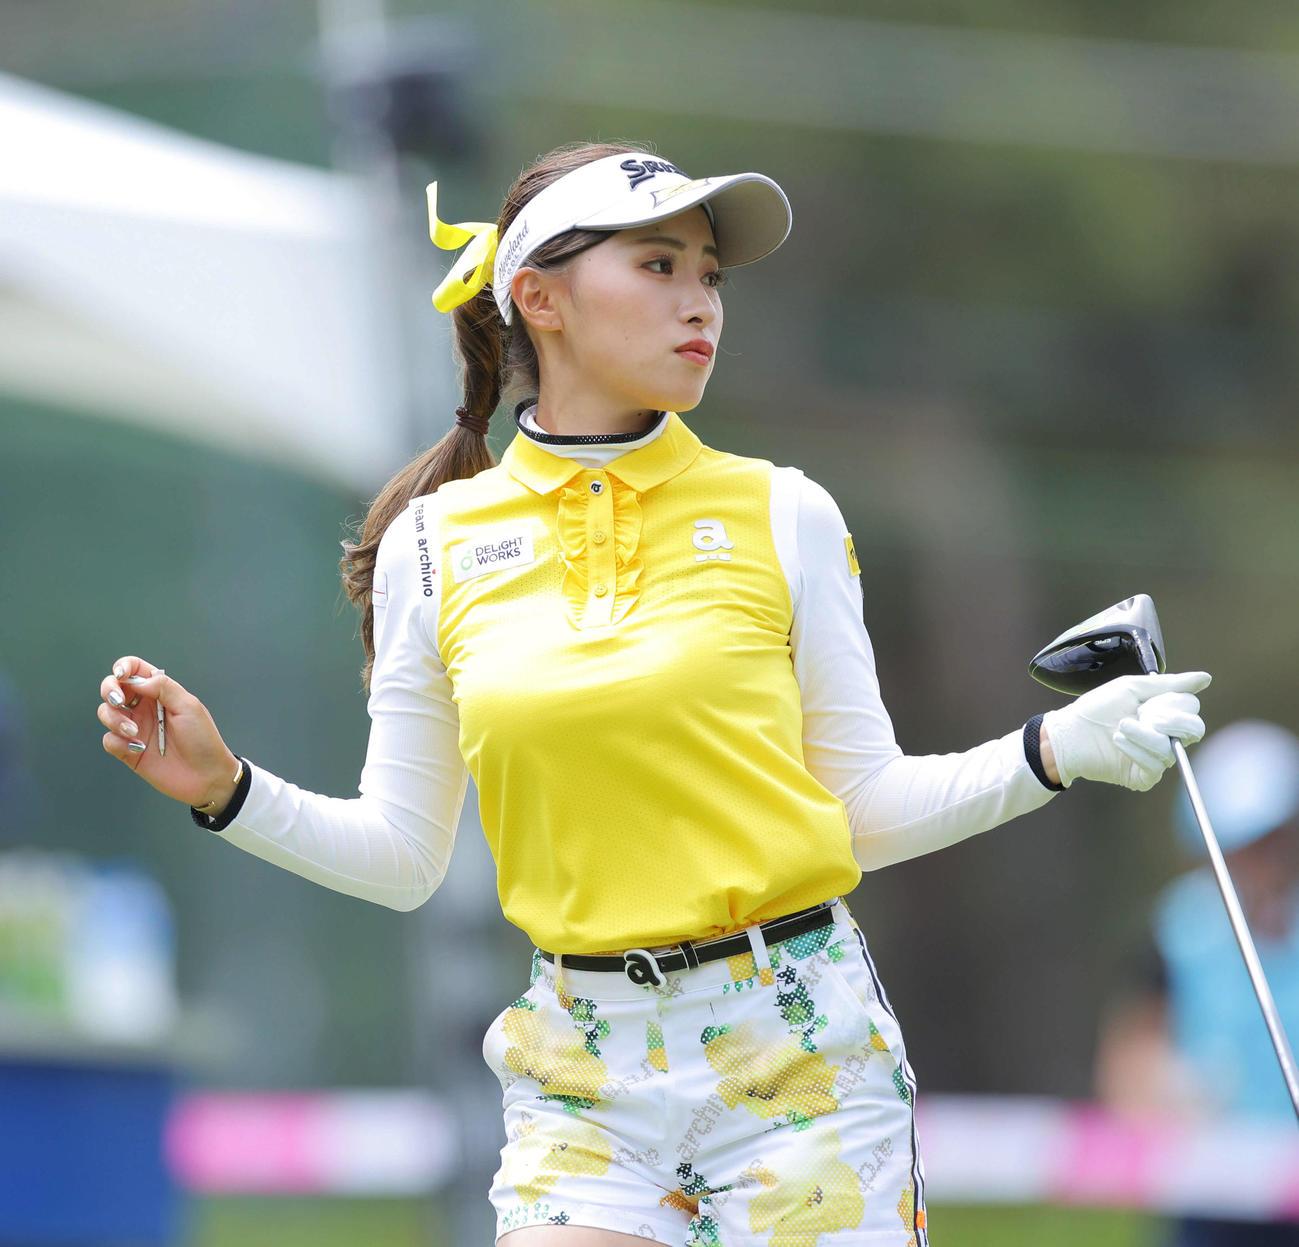 https://www.nikkansports.com/sports/golf/news/img/202105060000077-w1300_11.jpg